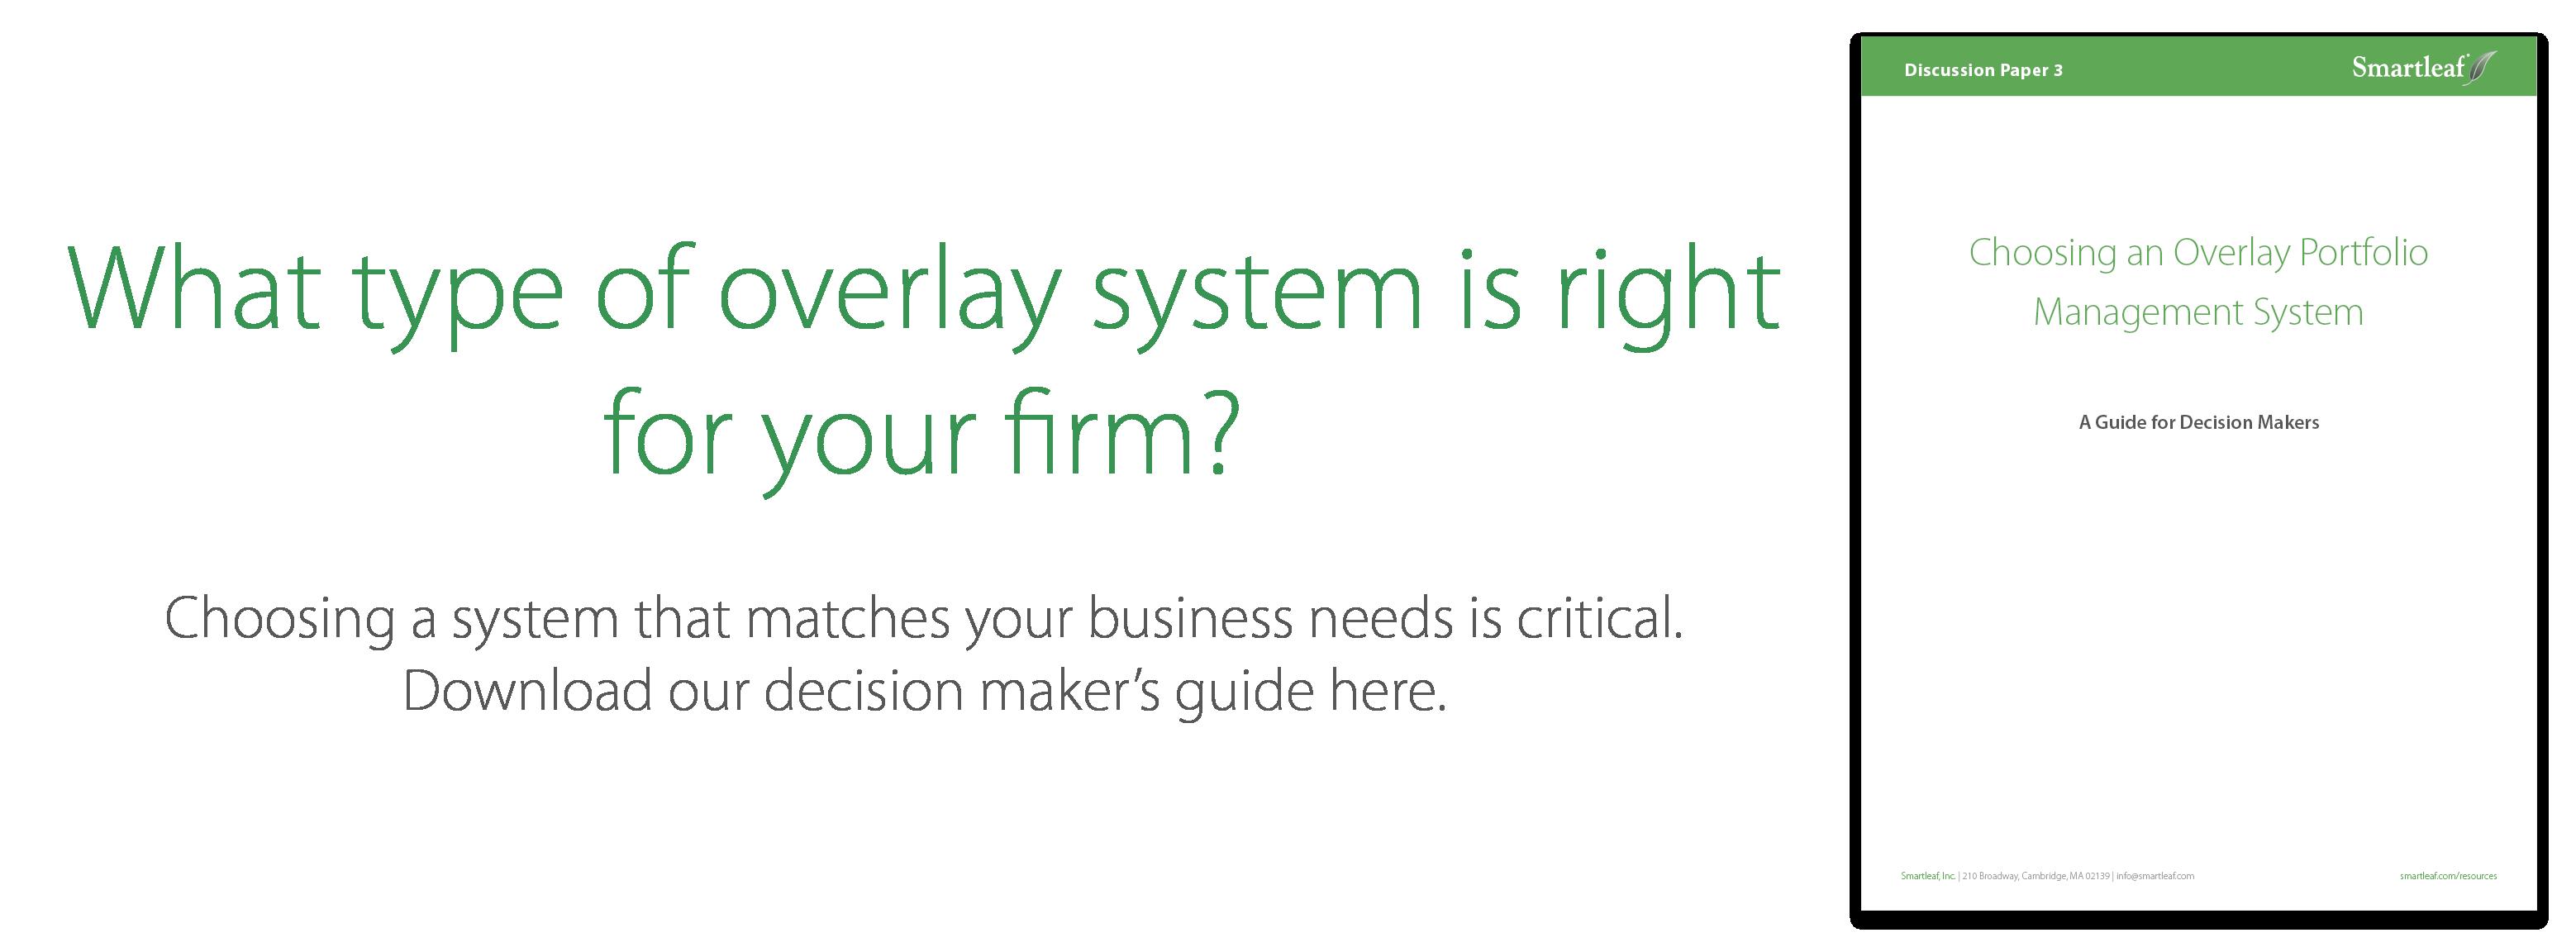 Choosing an Overlay Portfolio Management System